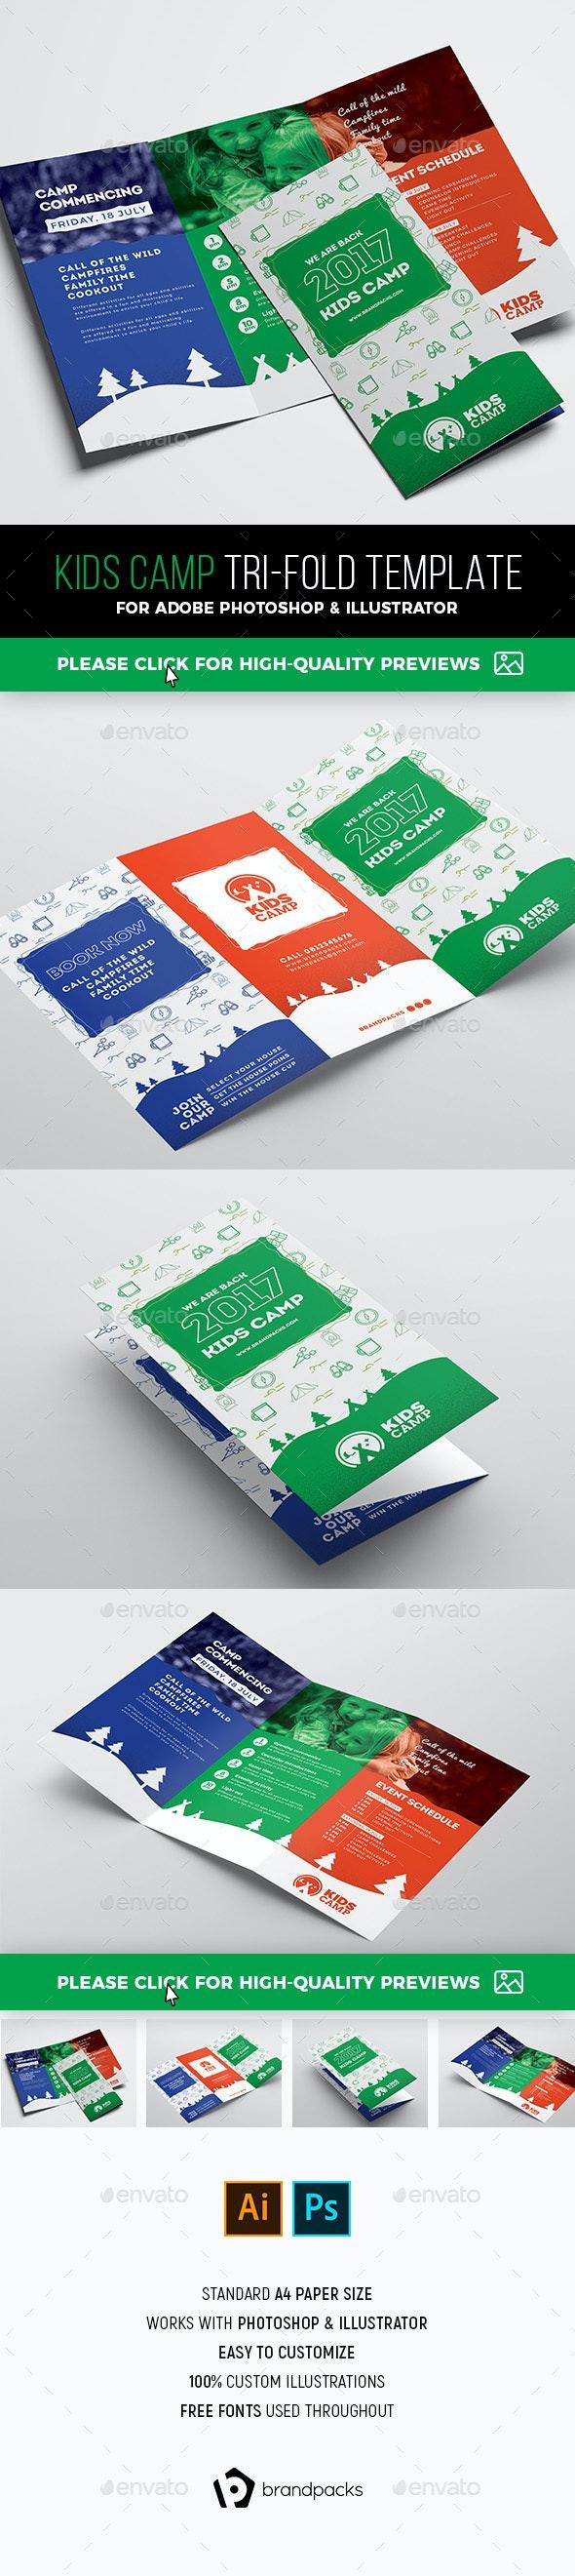 Kids Camp Tri-Fold Brochure Template - Corporate Brochures